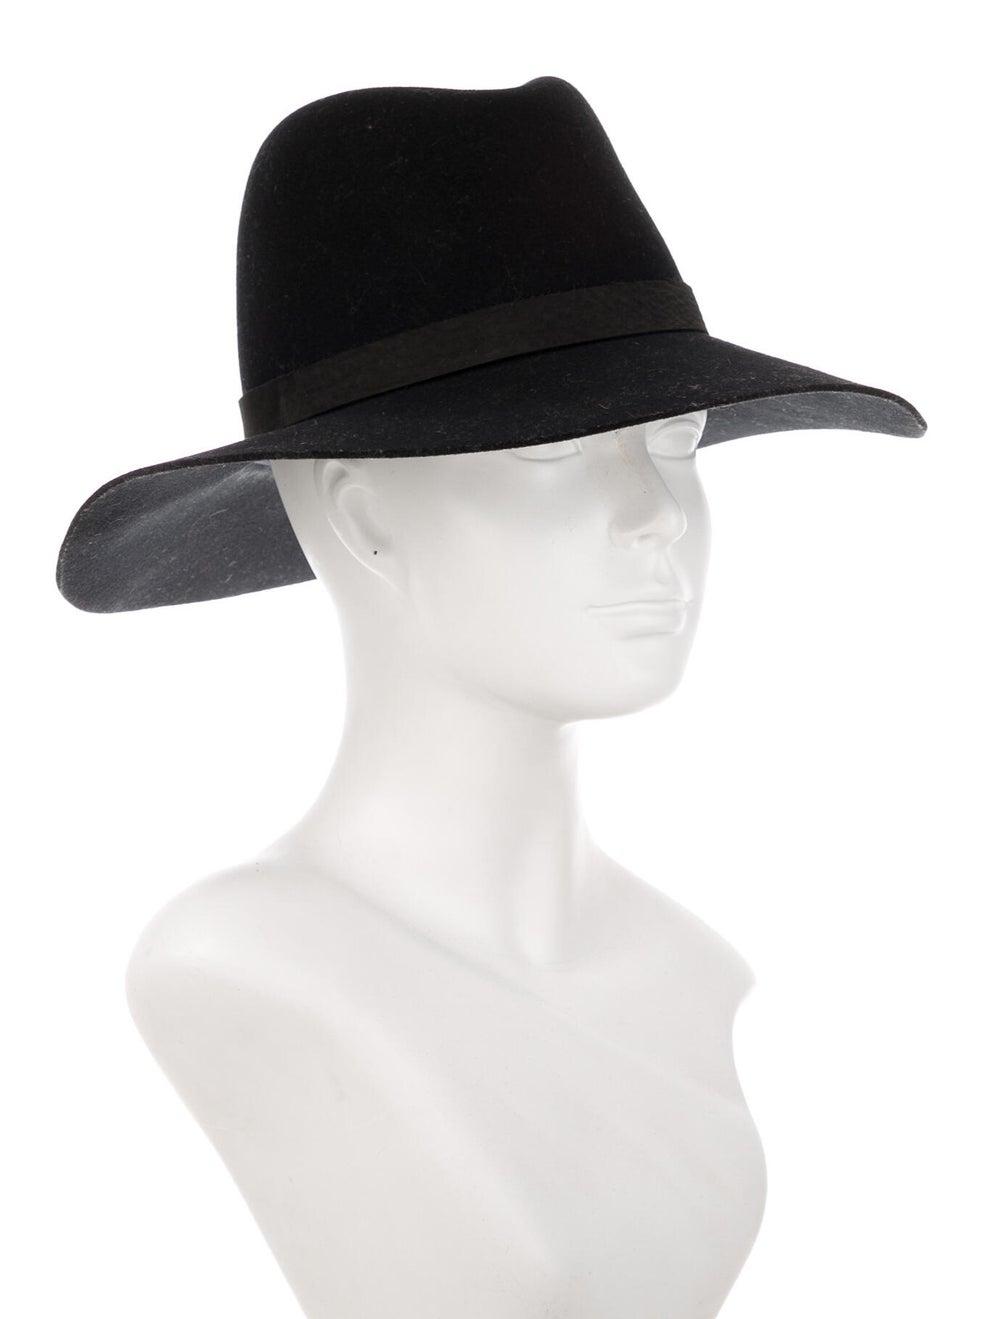 Janessa Leone Wool Fedora Hat Black - image 3